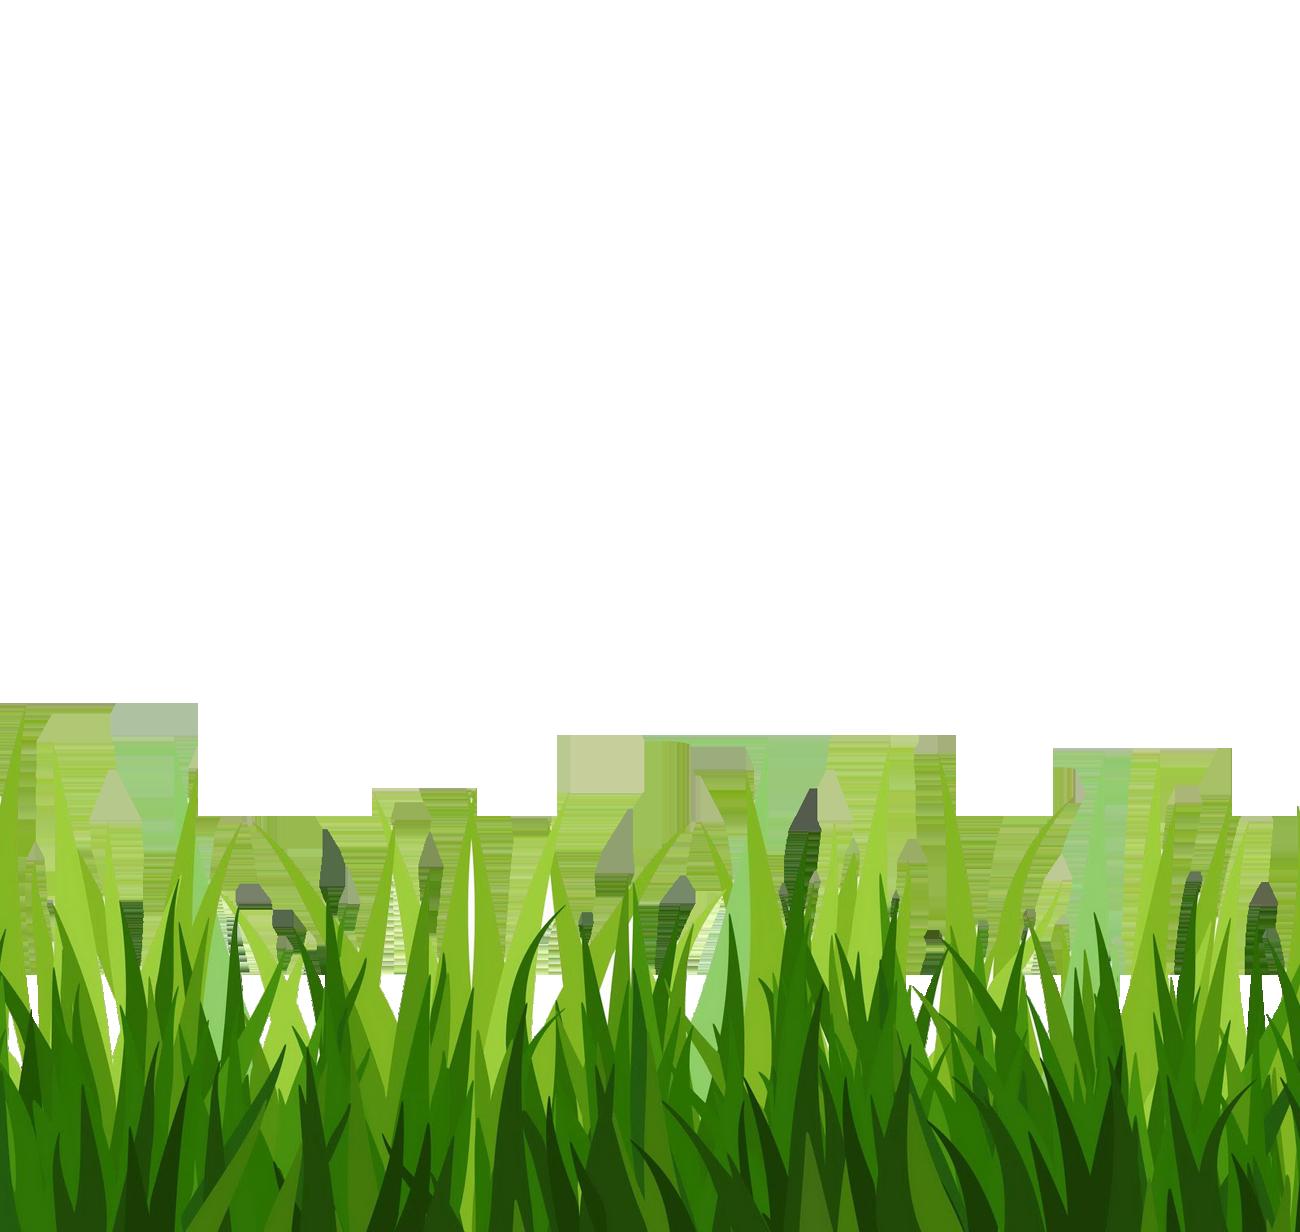 Sea Grass clipart grass border #11